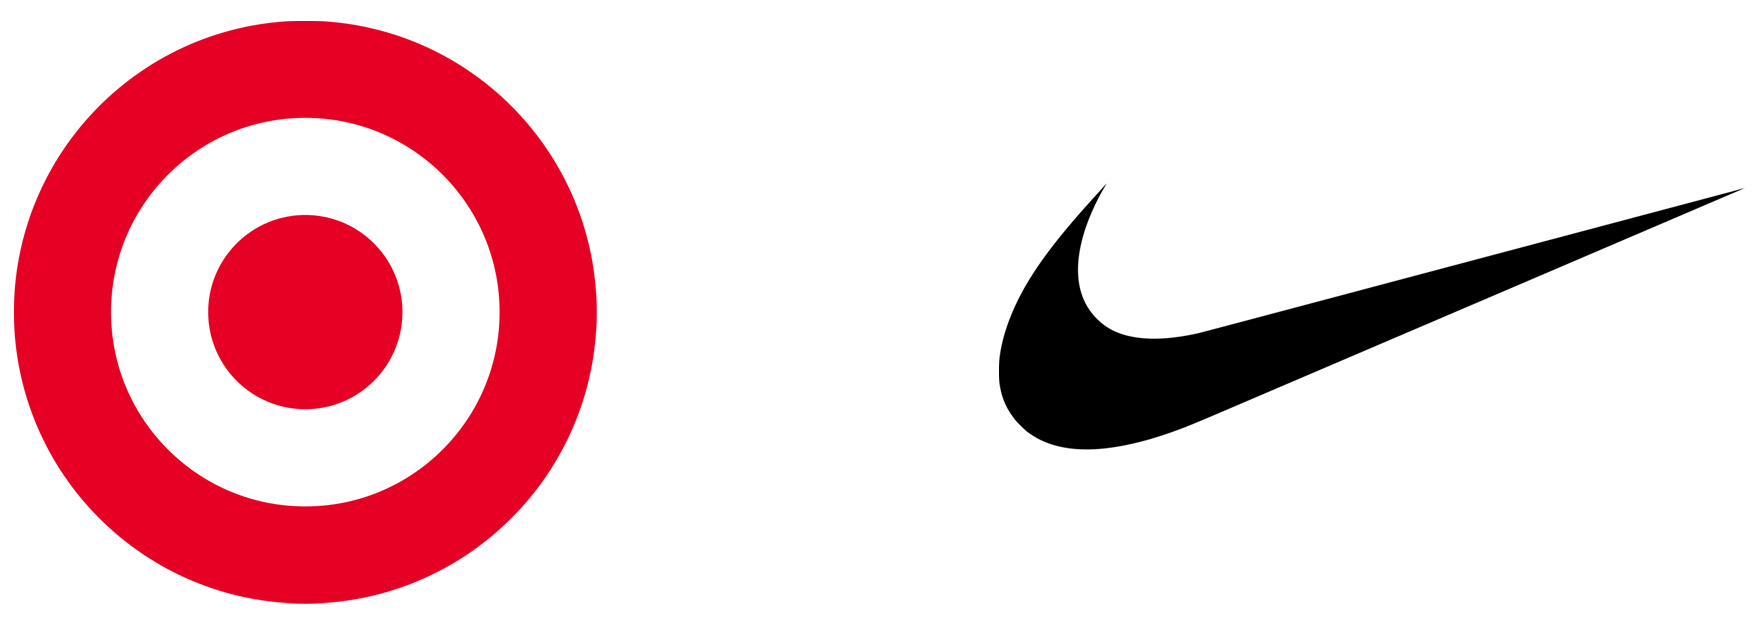 Negative Space: Logo Design with Michael Bierut - 99% Invisible